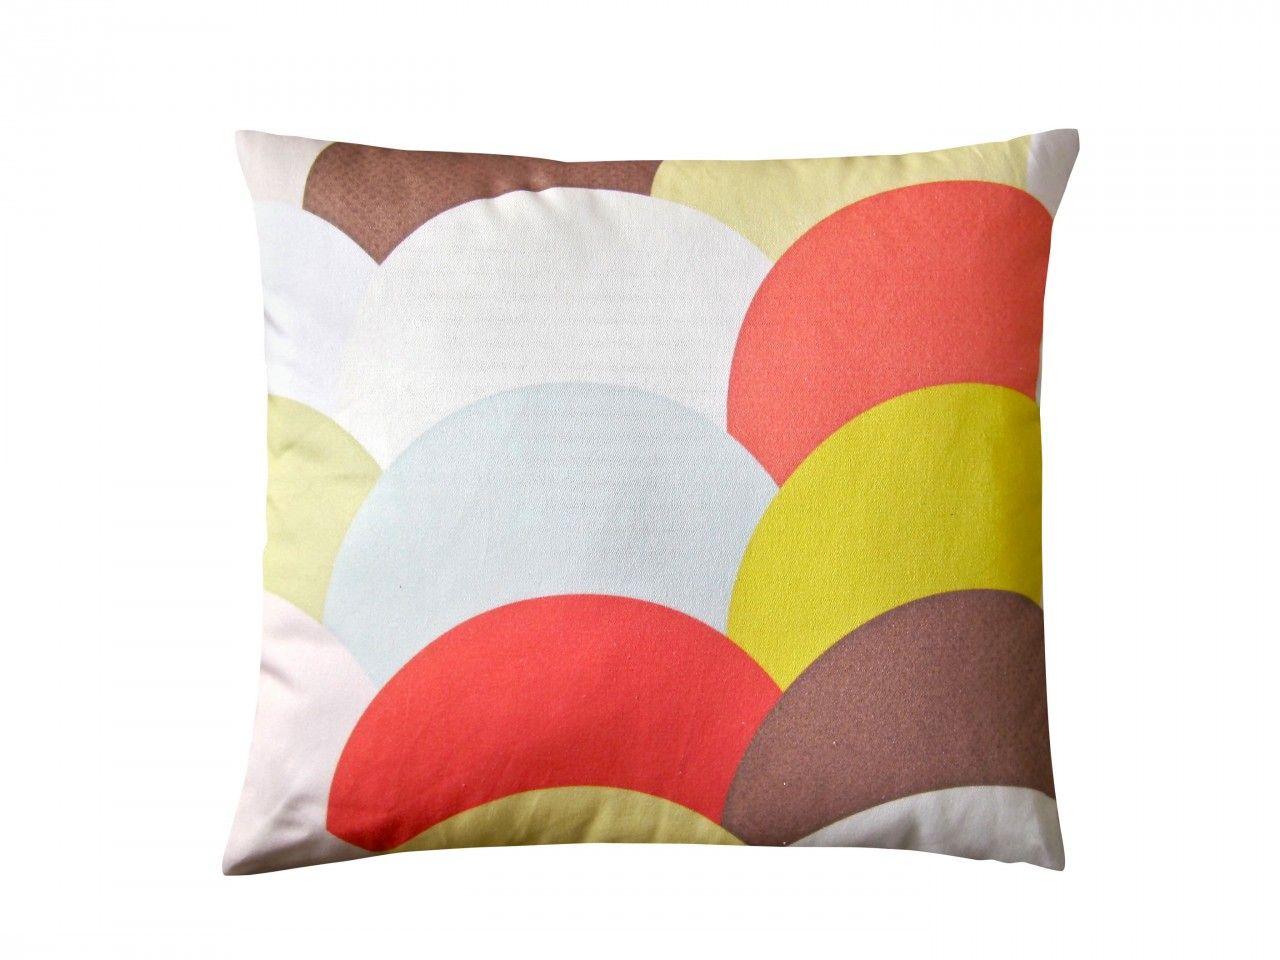 Deco cushion cover hardtofind cushions cushion cover